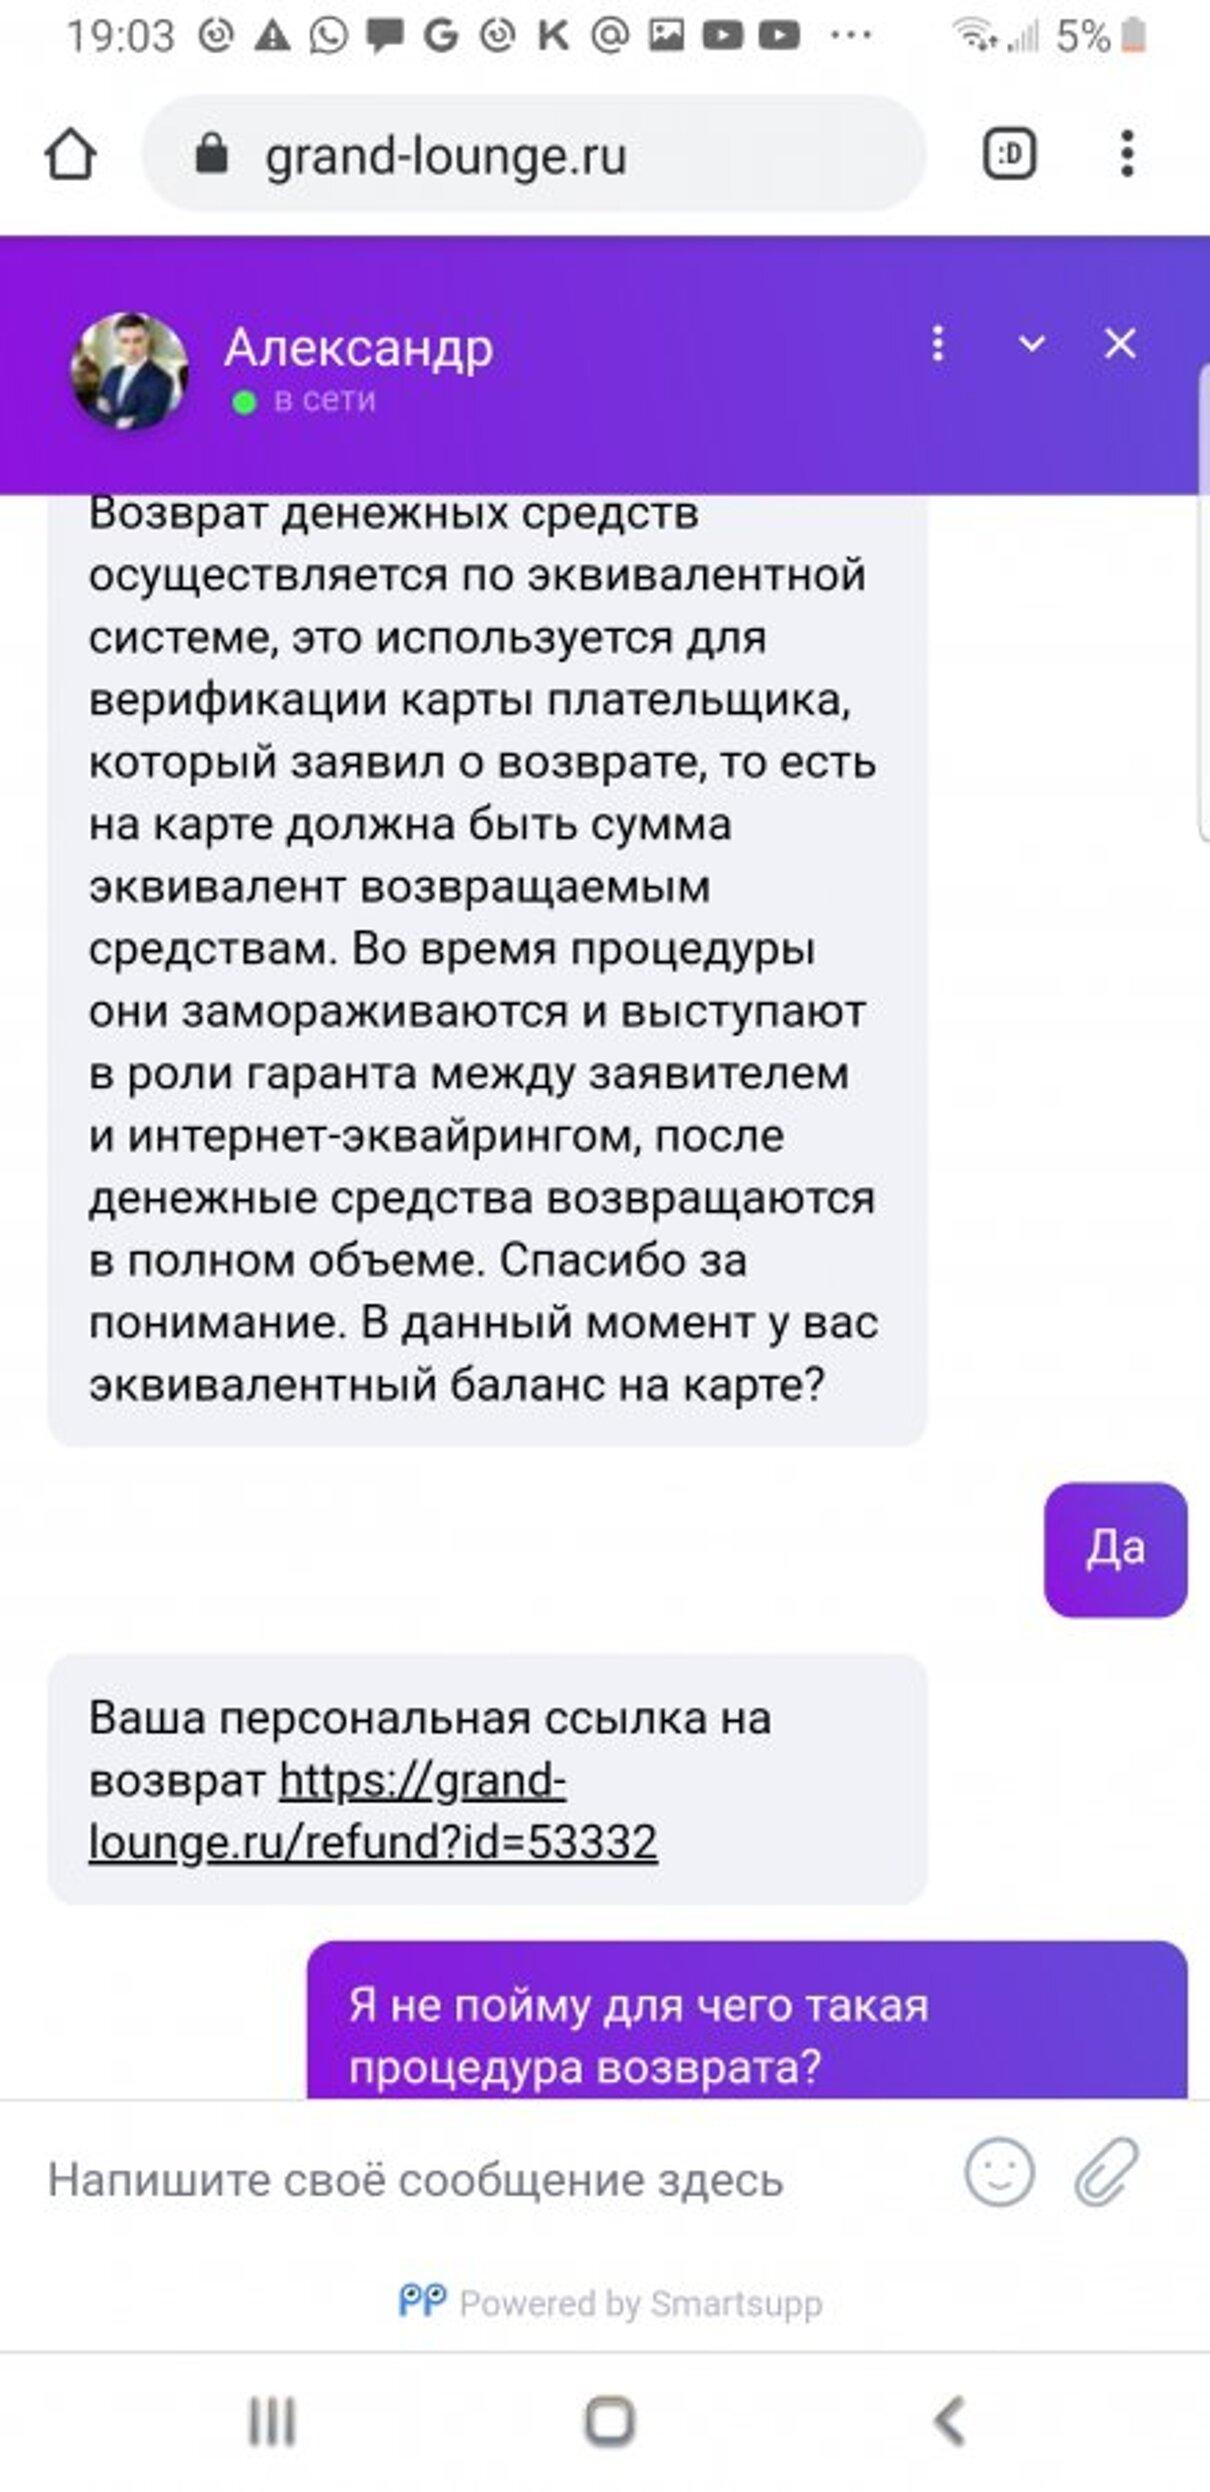 Жалоба-отзыв: Https://grand-lounge.ru - Мошенники